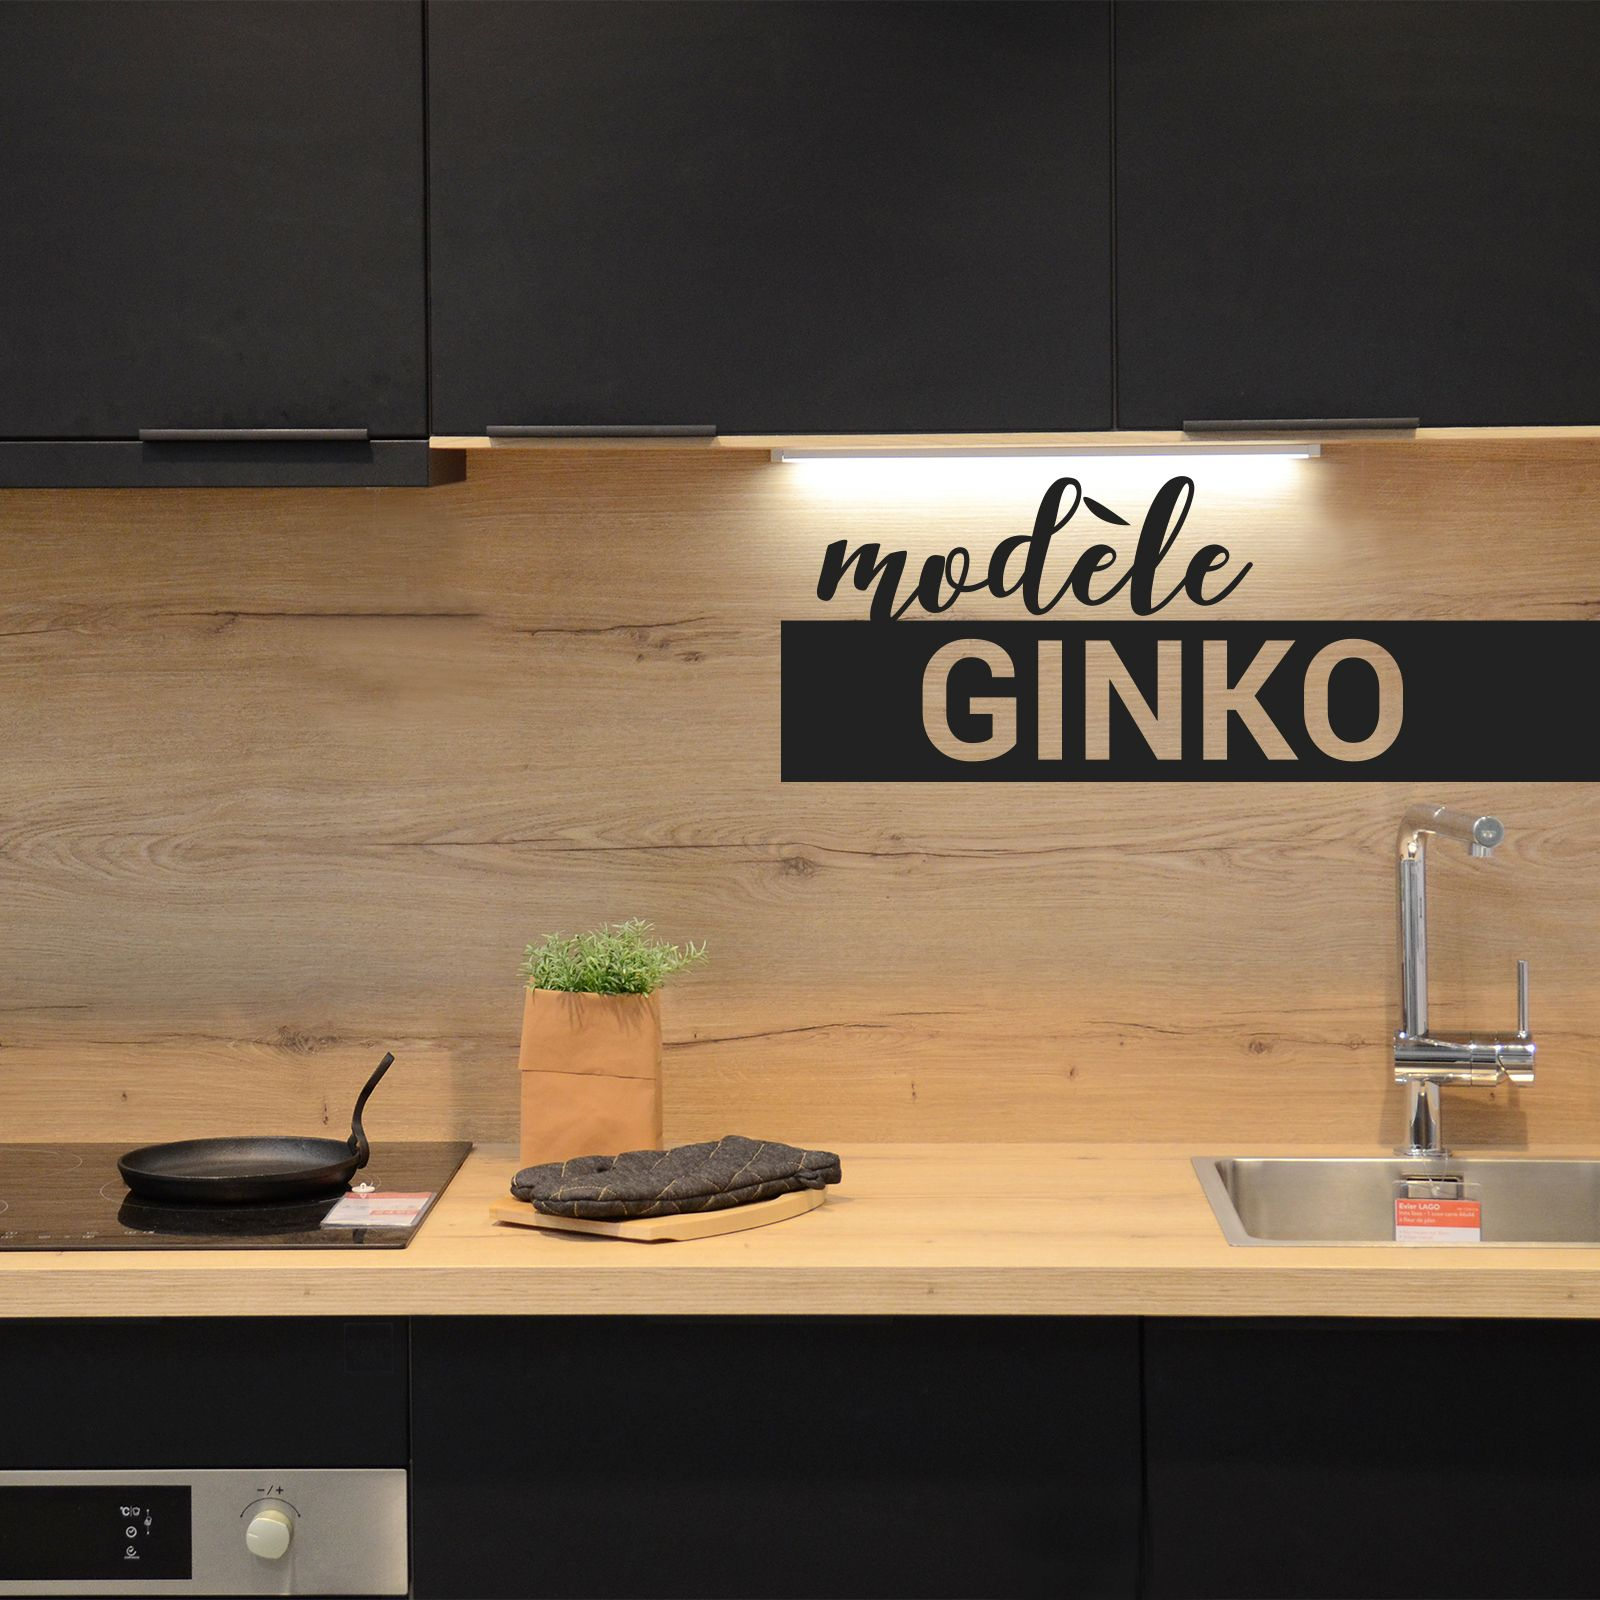 Cuisine Noire Porte Effet Soft Touch Ginko Noir Mat Oskab Oskab Cuisine Noire Cuisine